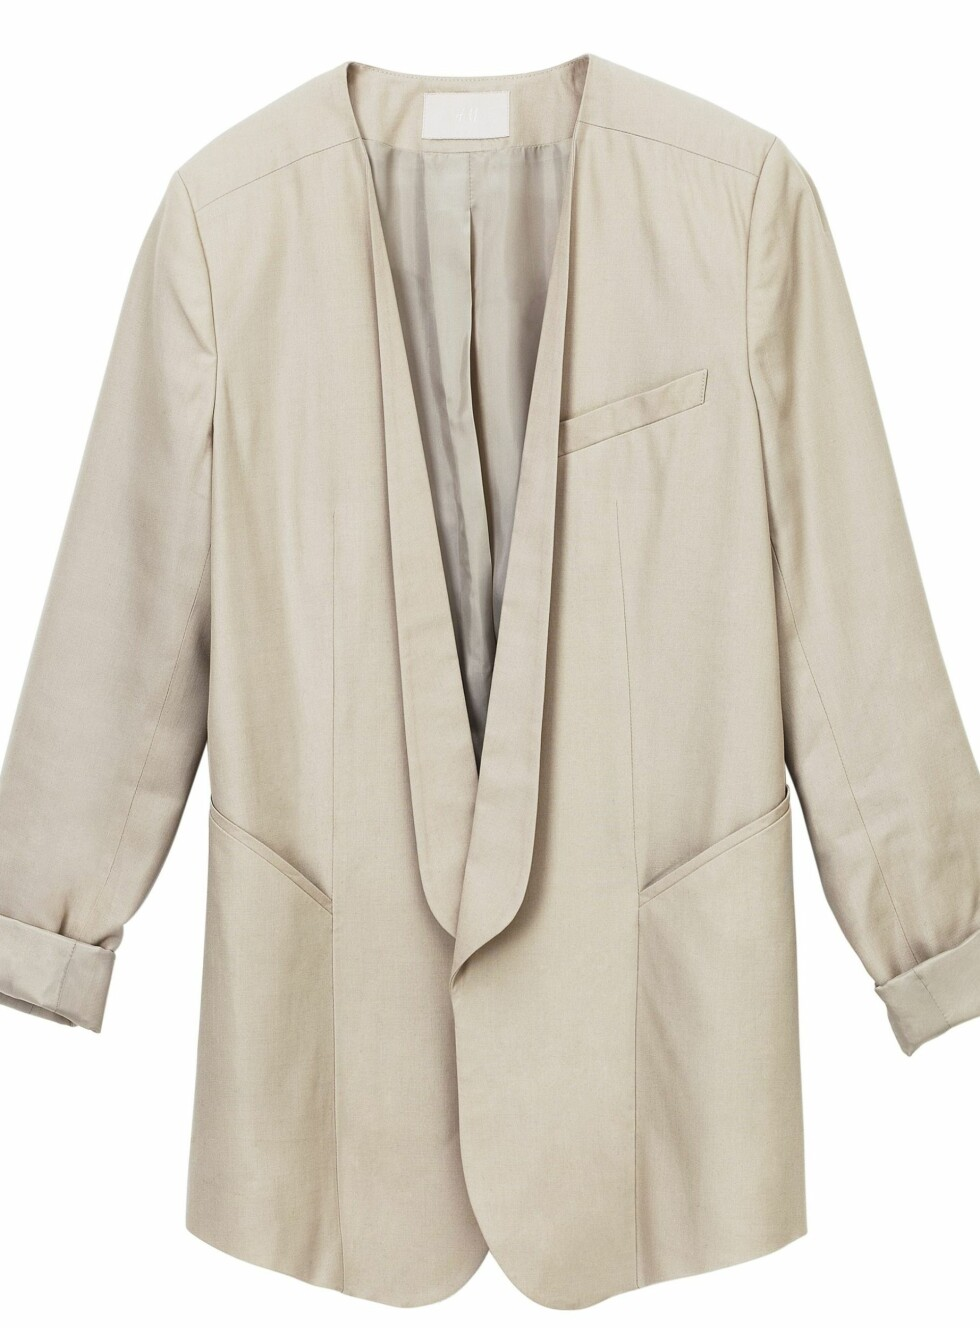 Herreinspirert 80-talls blazer (kr 500, H&M).